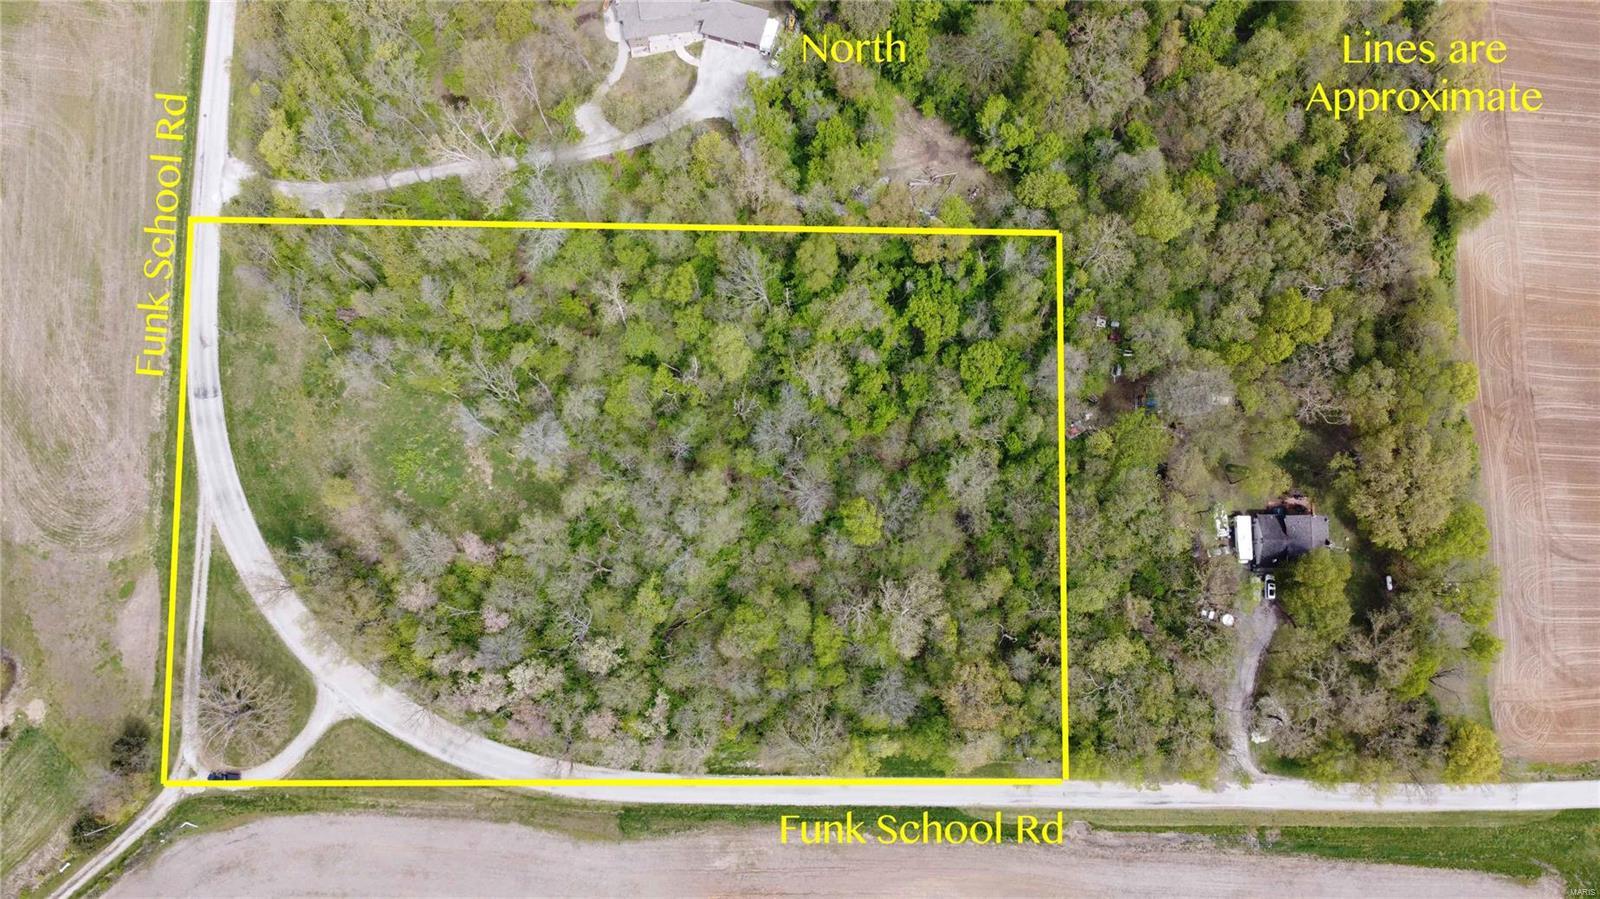 0 000 Funk School Rd Property Photo - Freeburg, IL real estate listing